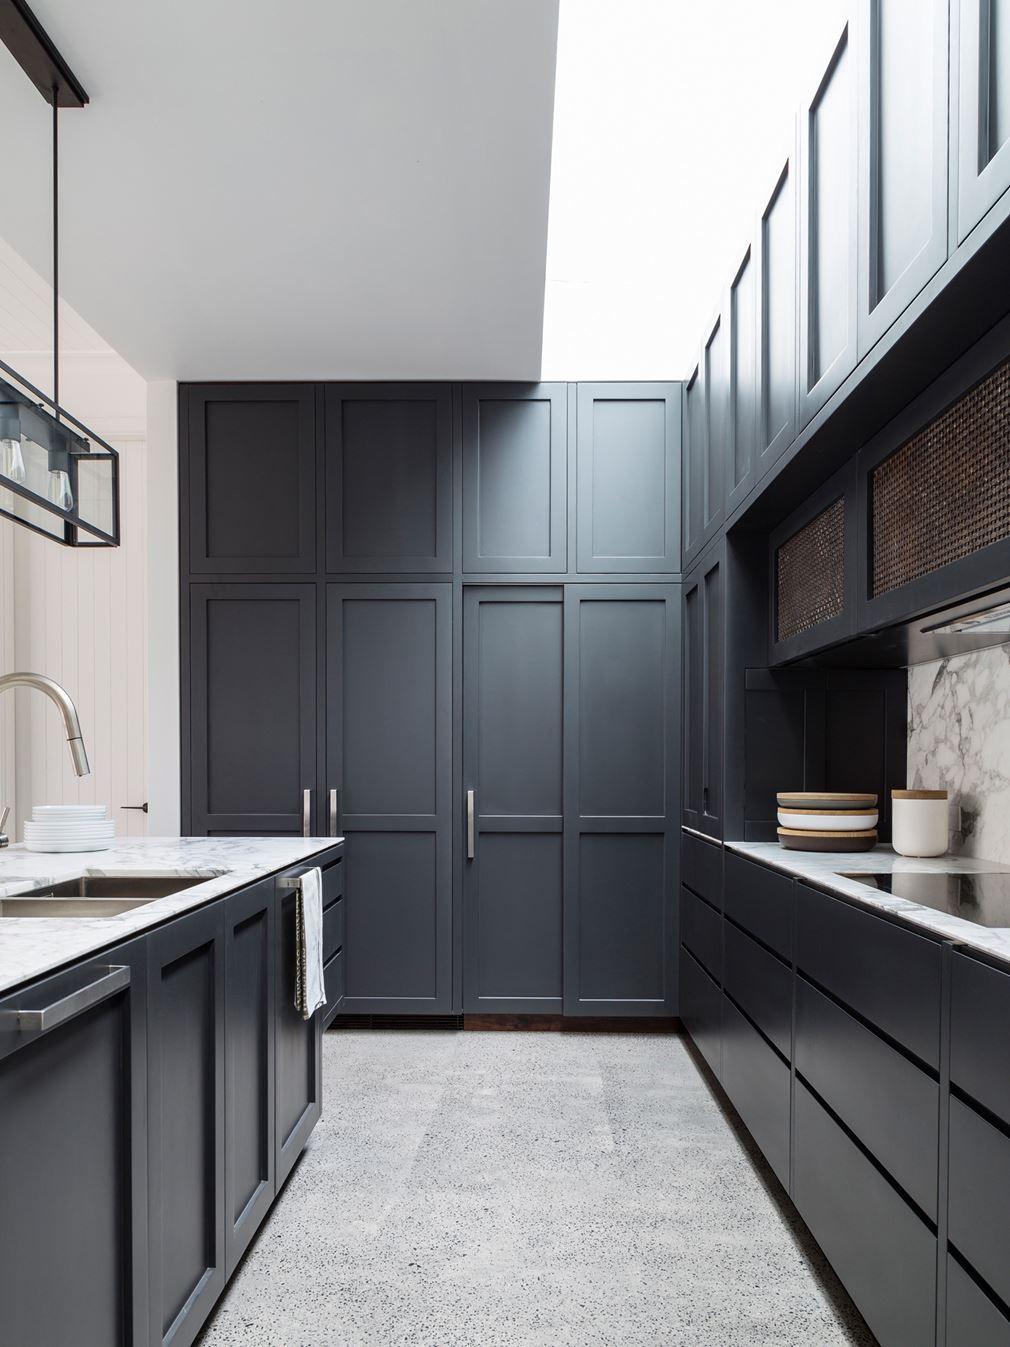 Cocina negra de estilo rústico | Cocinas negras | Pinterest ...